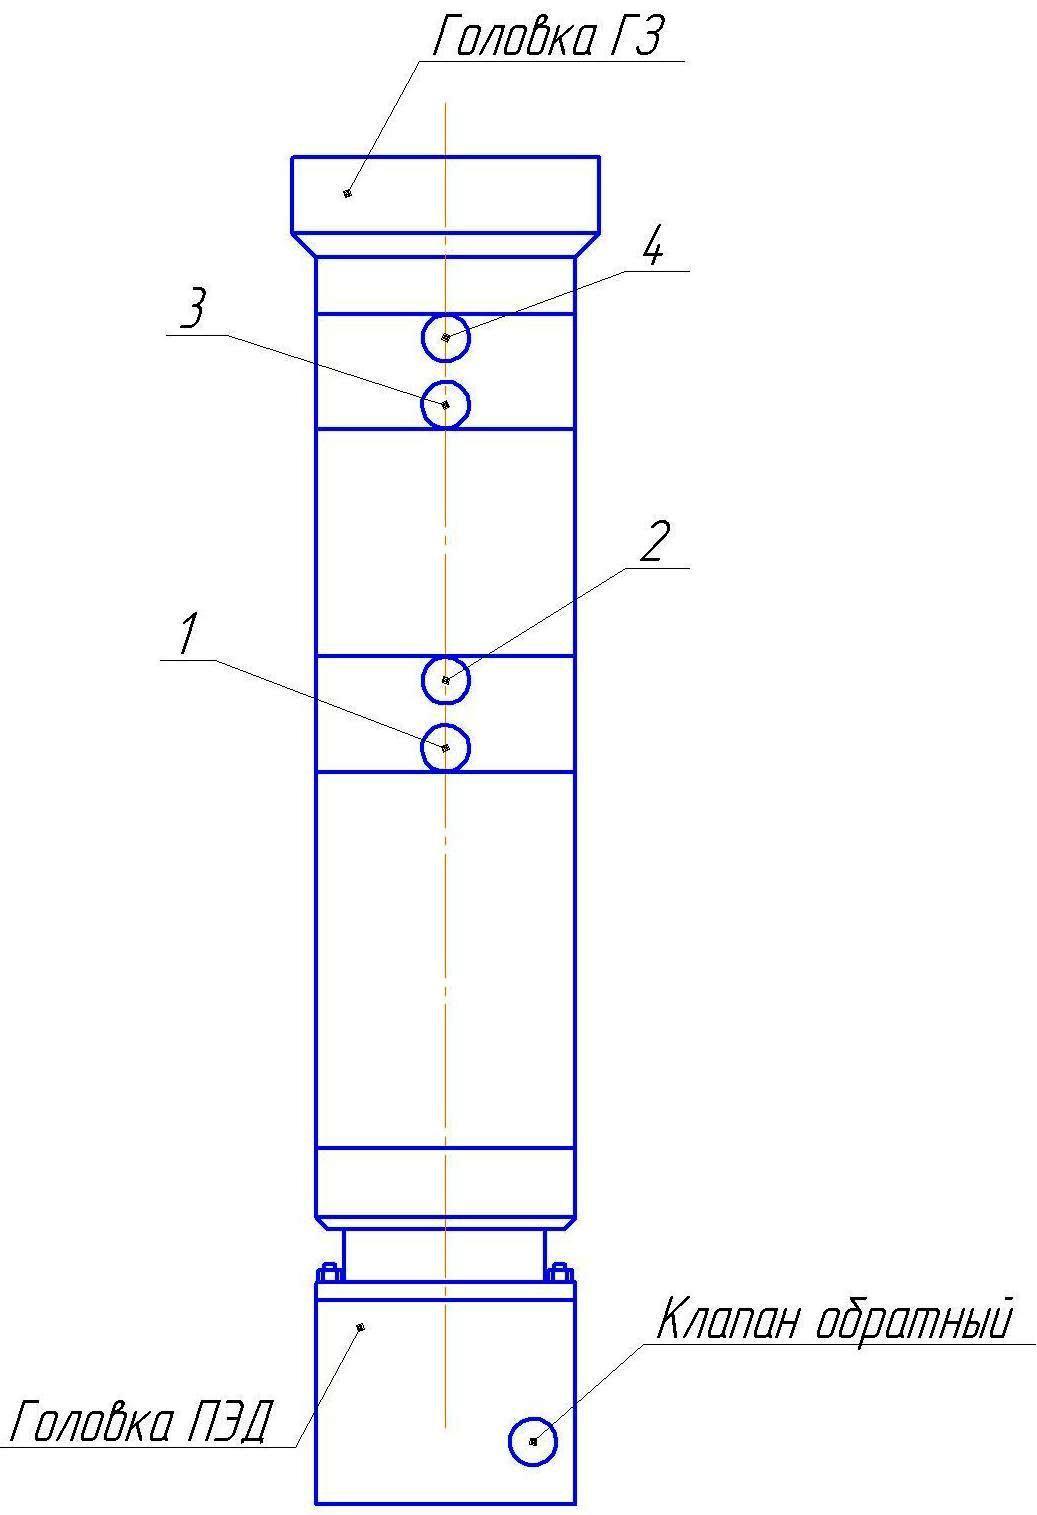 Гидрозащита П92ДП, ПК92ДП, ПК92ДПТ (МДВ-1)